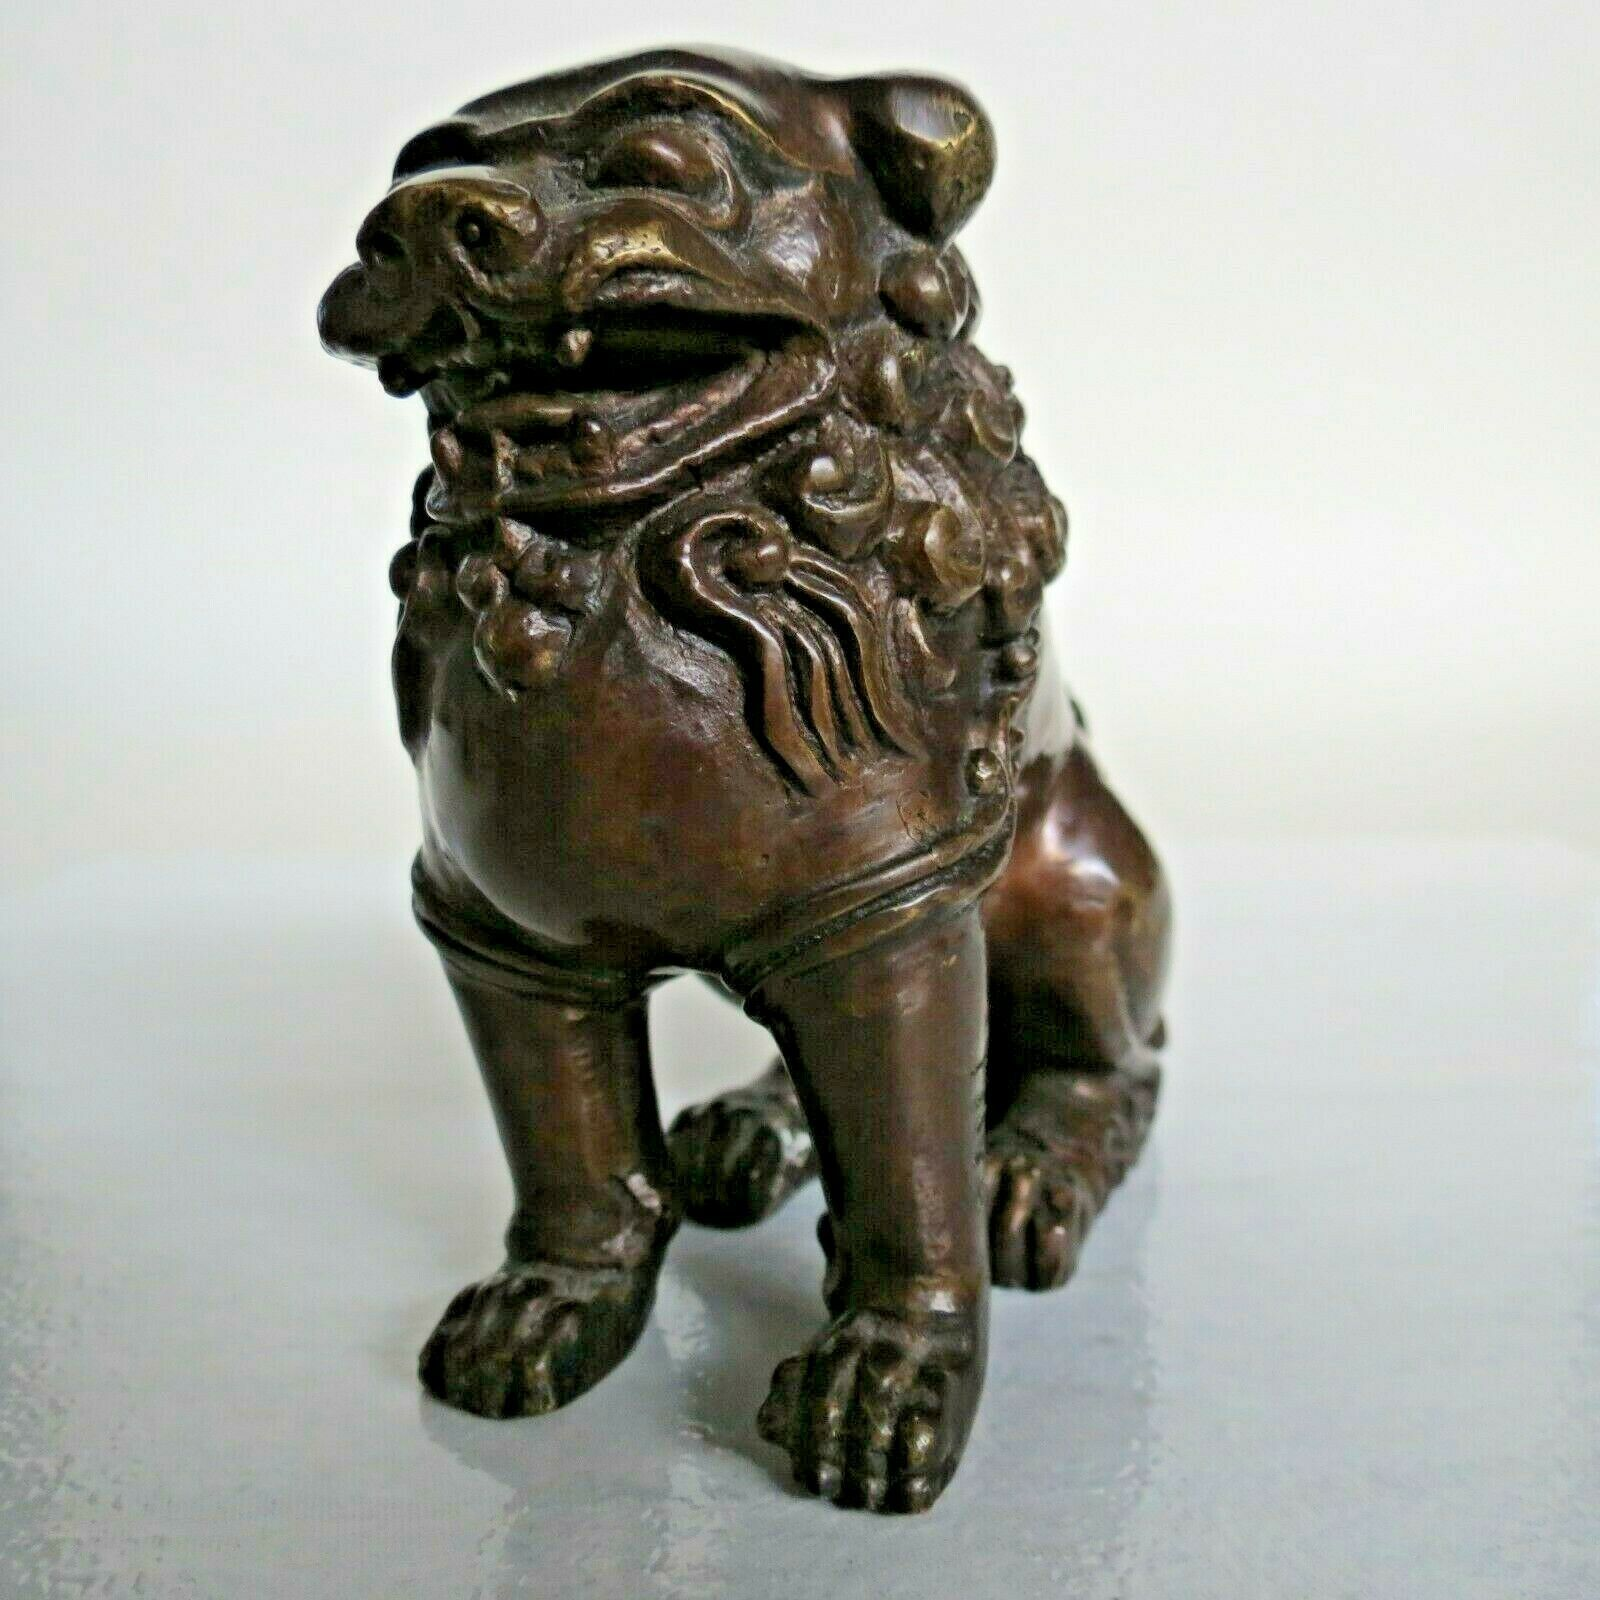 "Ancient Foo Dog Bronze Japan Hiro antique figurine 4.25x4x2.25"" old age unknown"